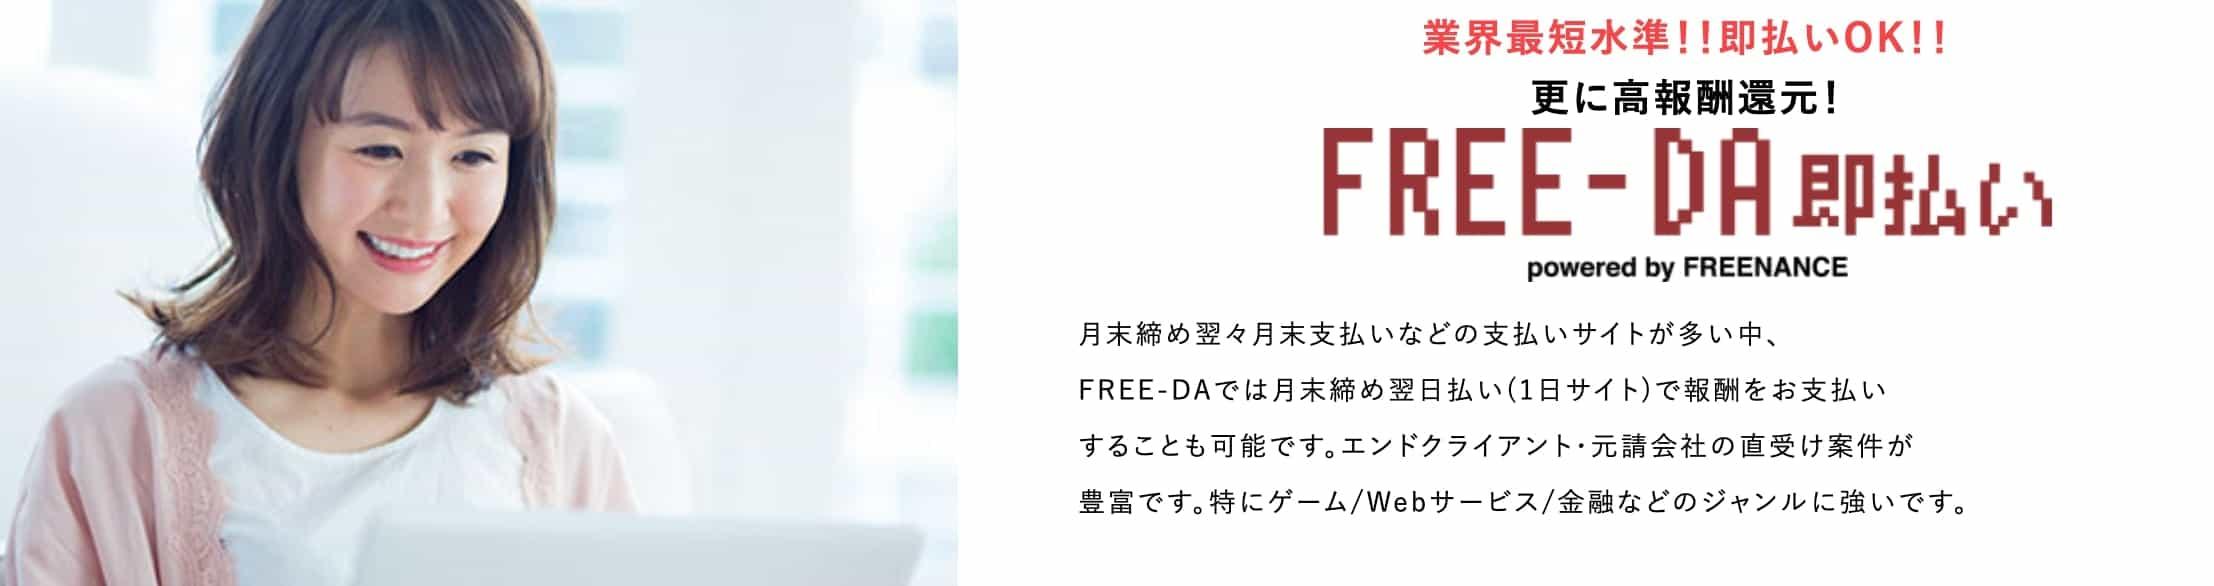 FREE-DAのメリットと評判・口コミ